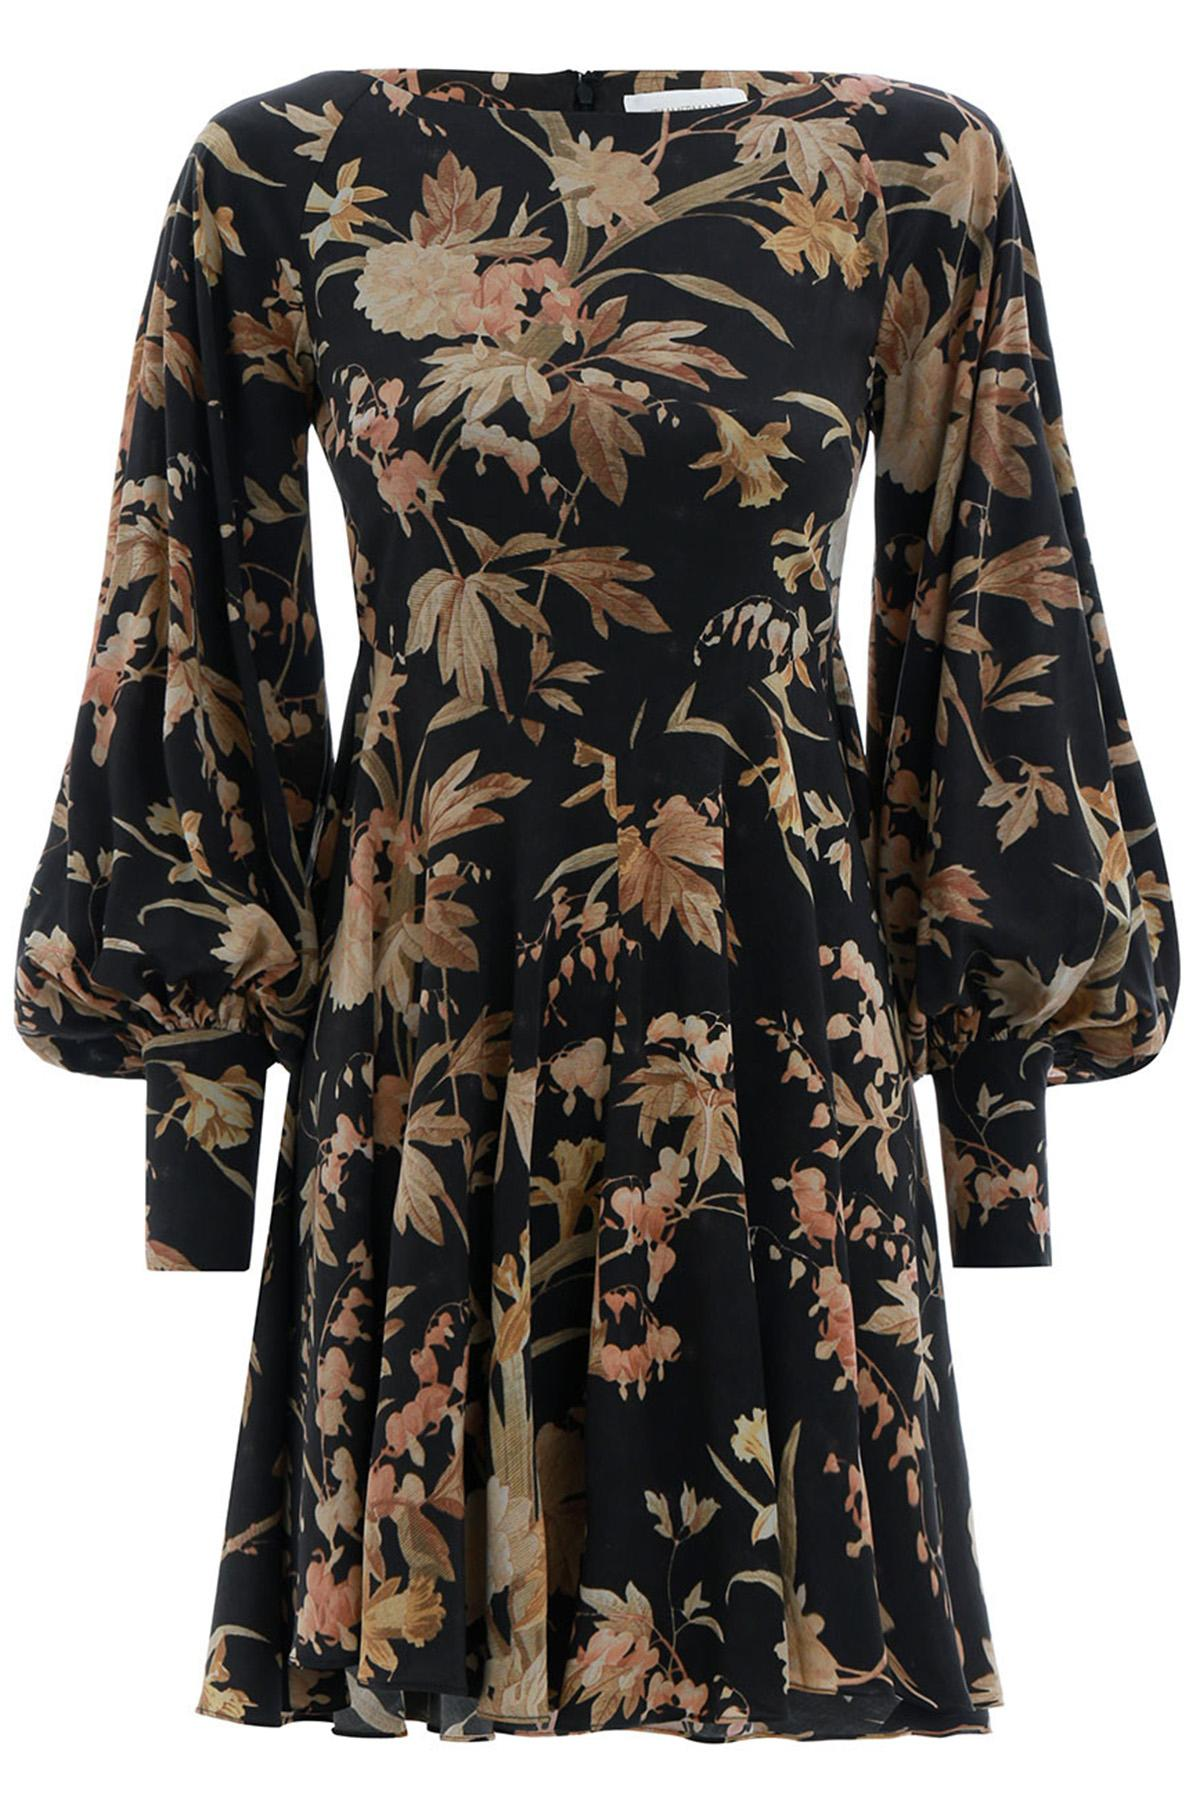 2780ed0583f6b Zimmermann Unbridled Basque Mini Dress In Black Jonquil Floral